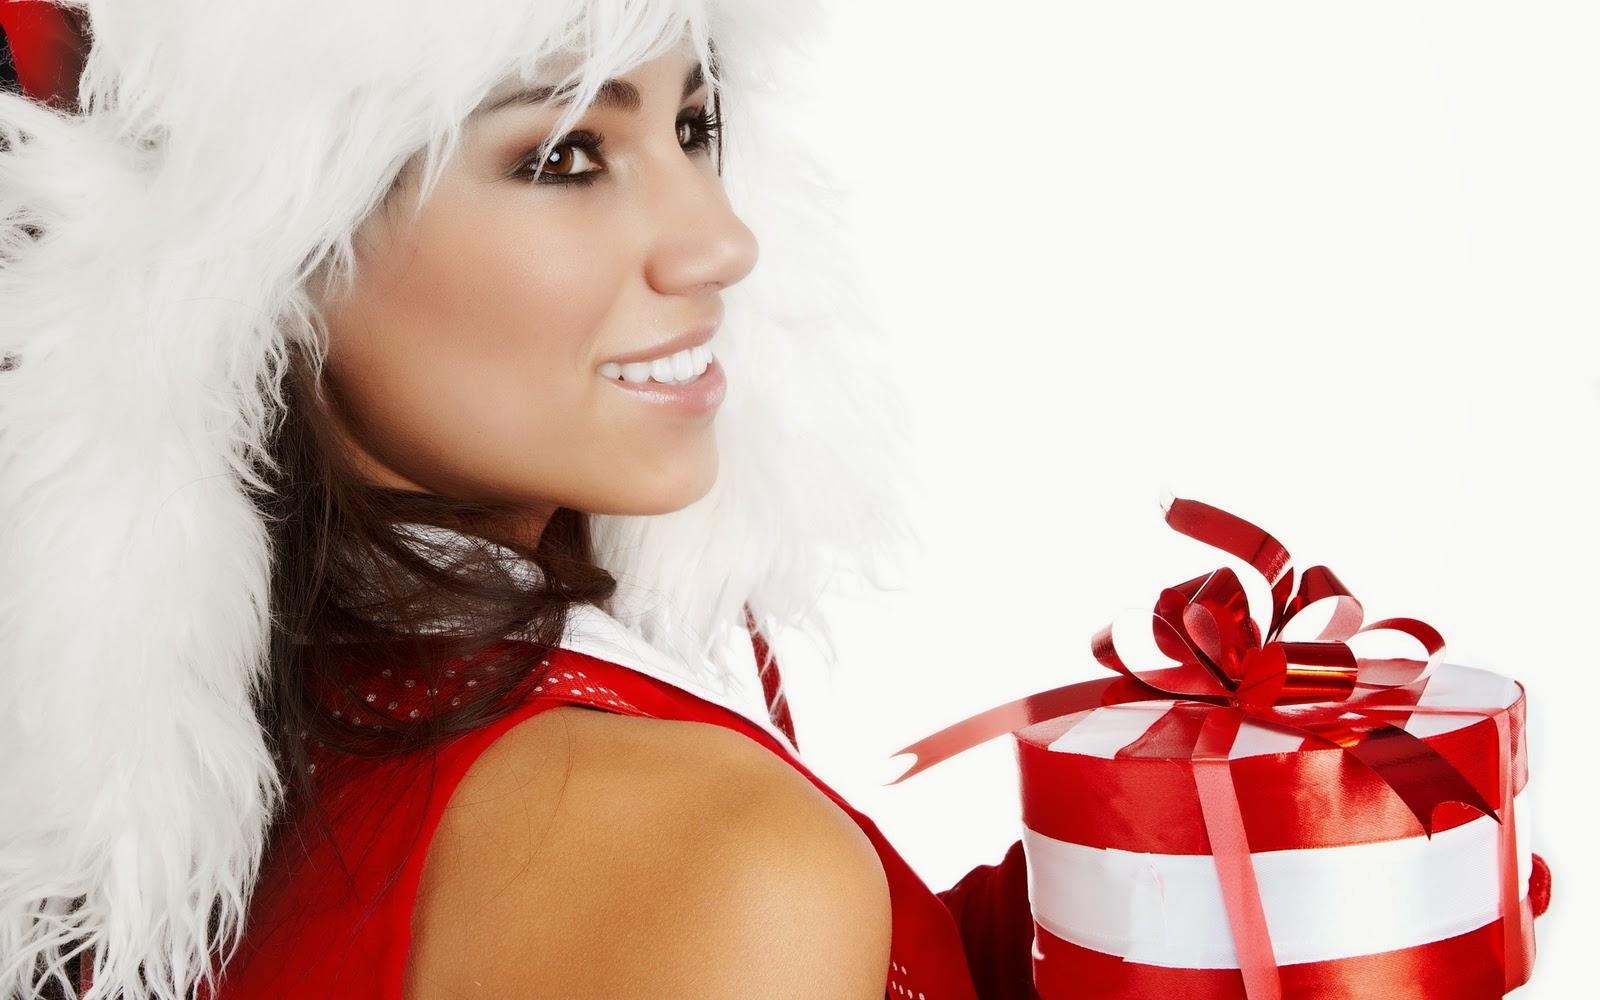 Entertainment World: Beutifull Christmas Girls HD Wallpapers